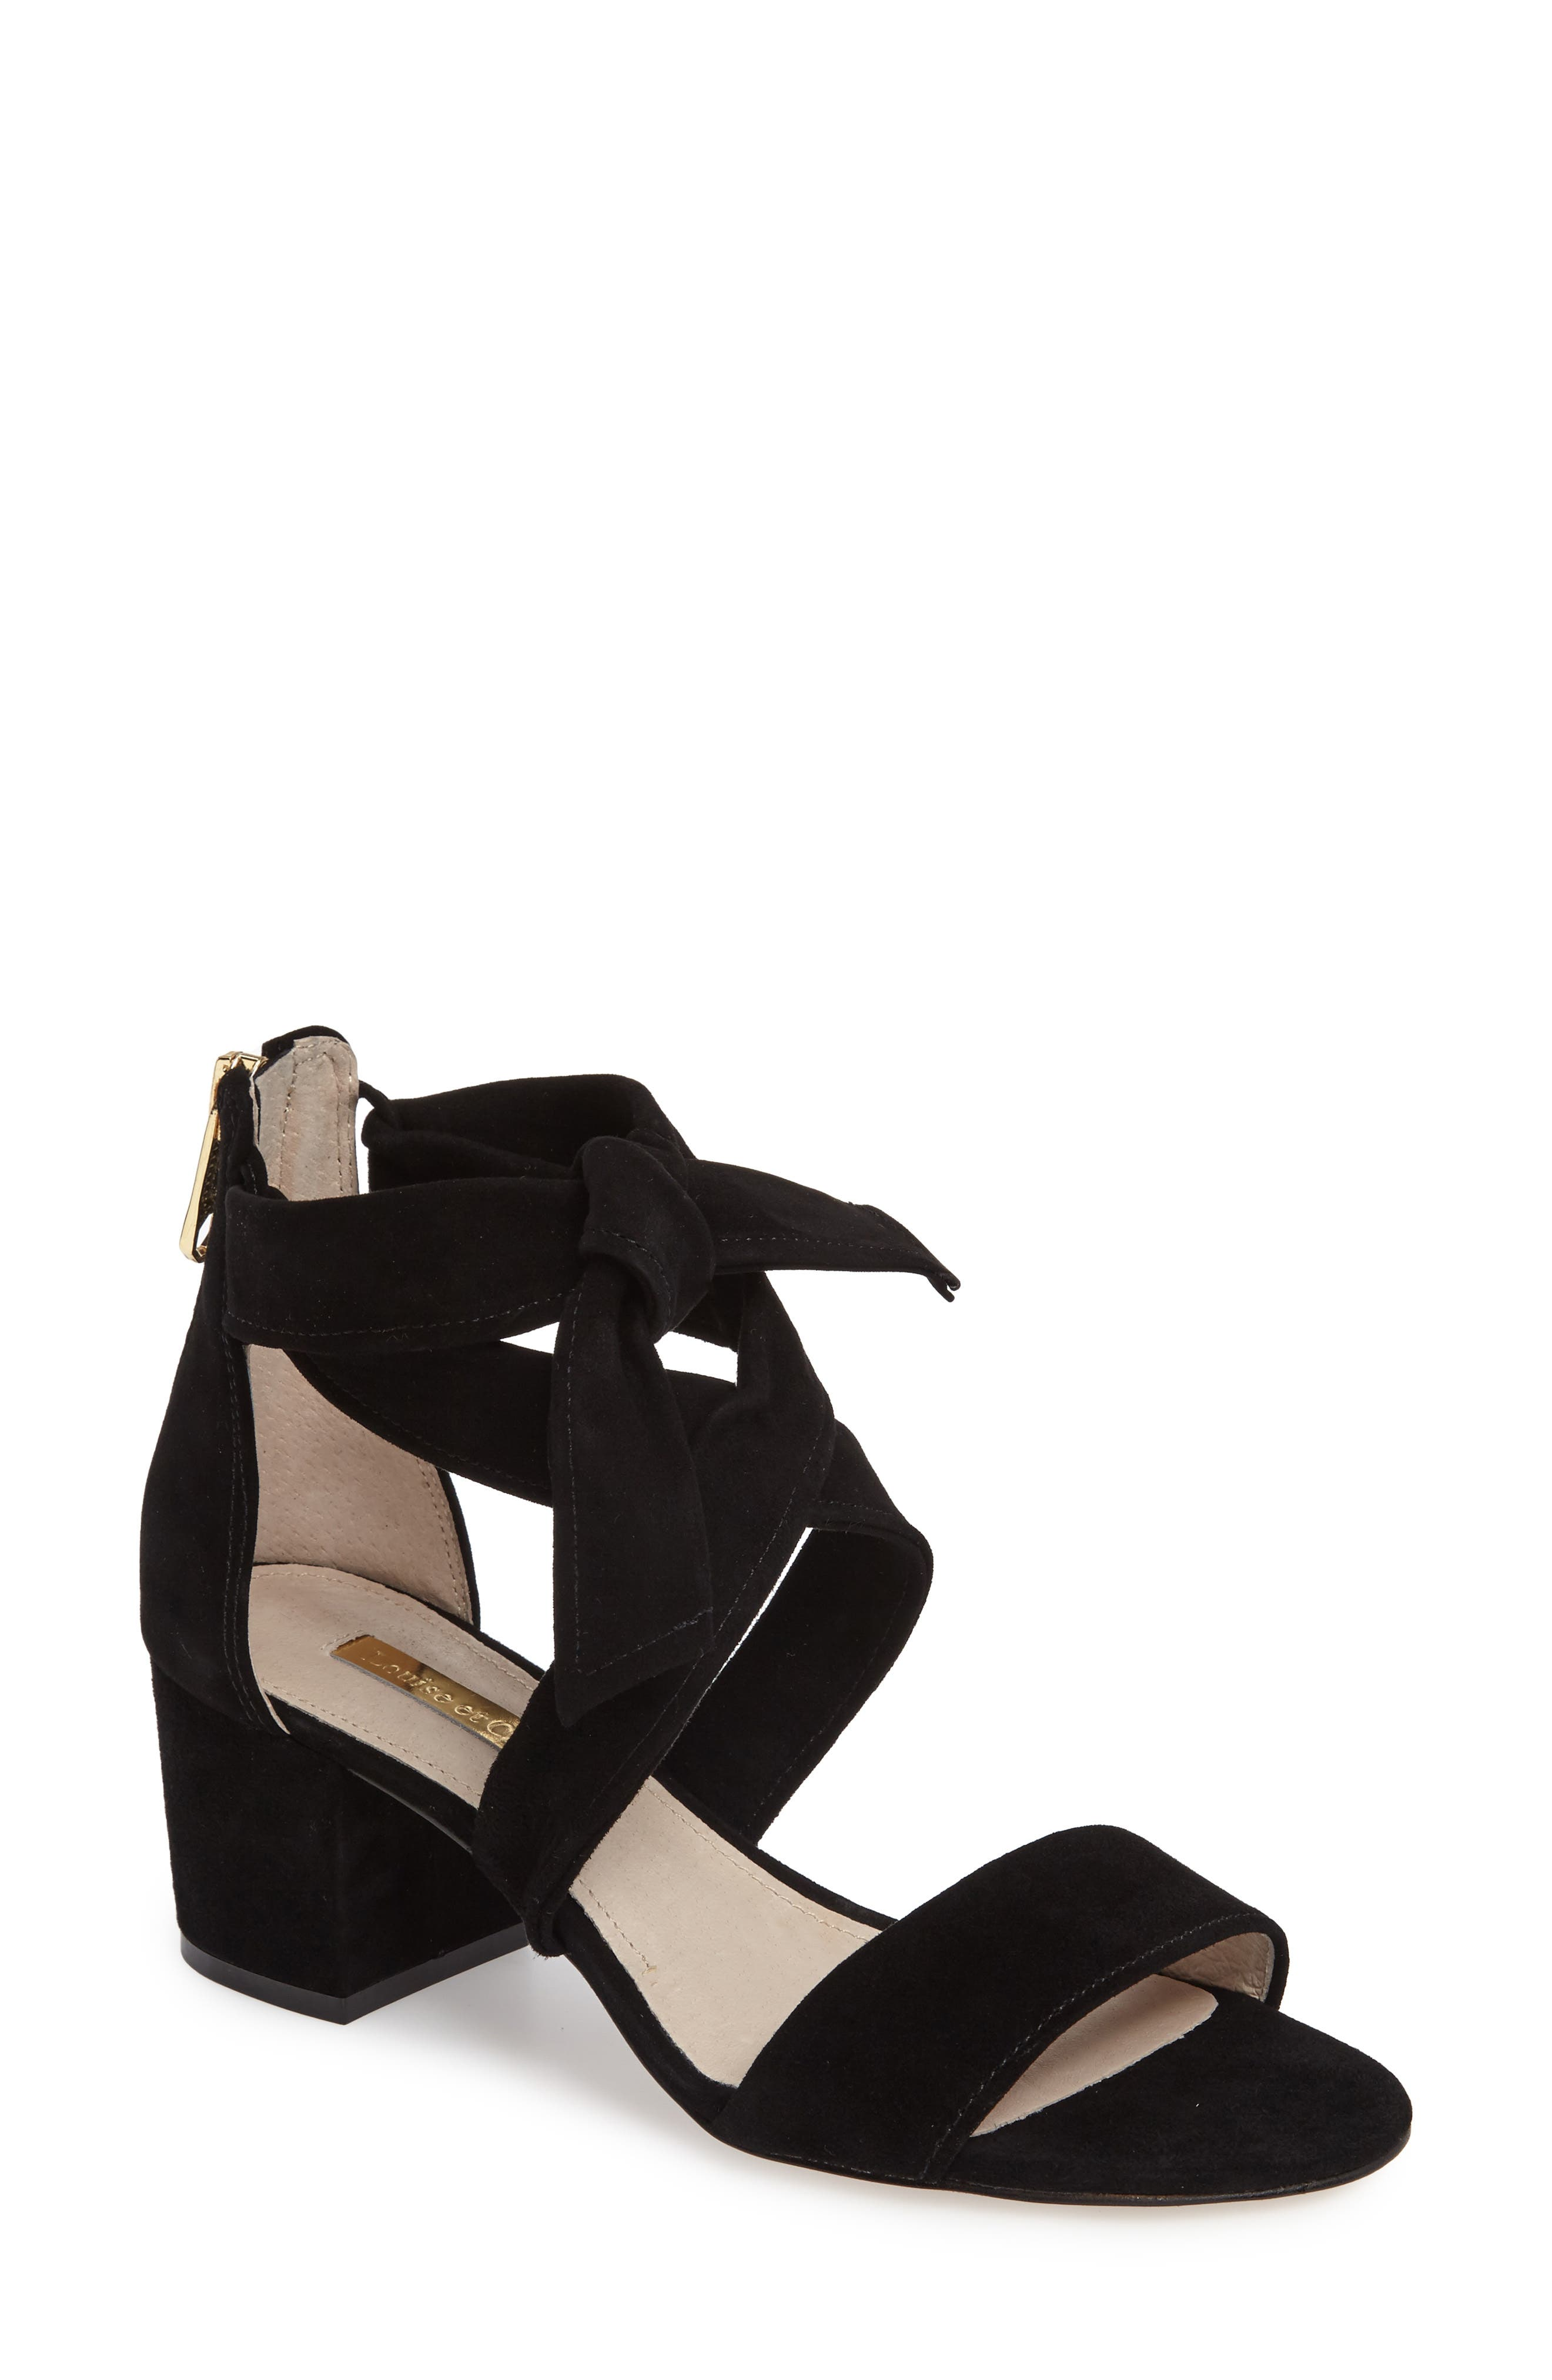 Gia Block Heel Sandal,                             Main thumbnail 1, color,                             001